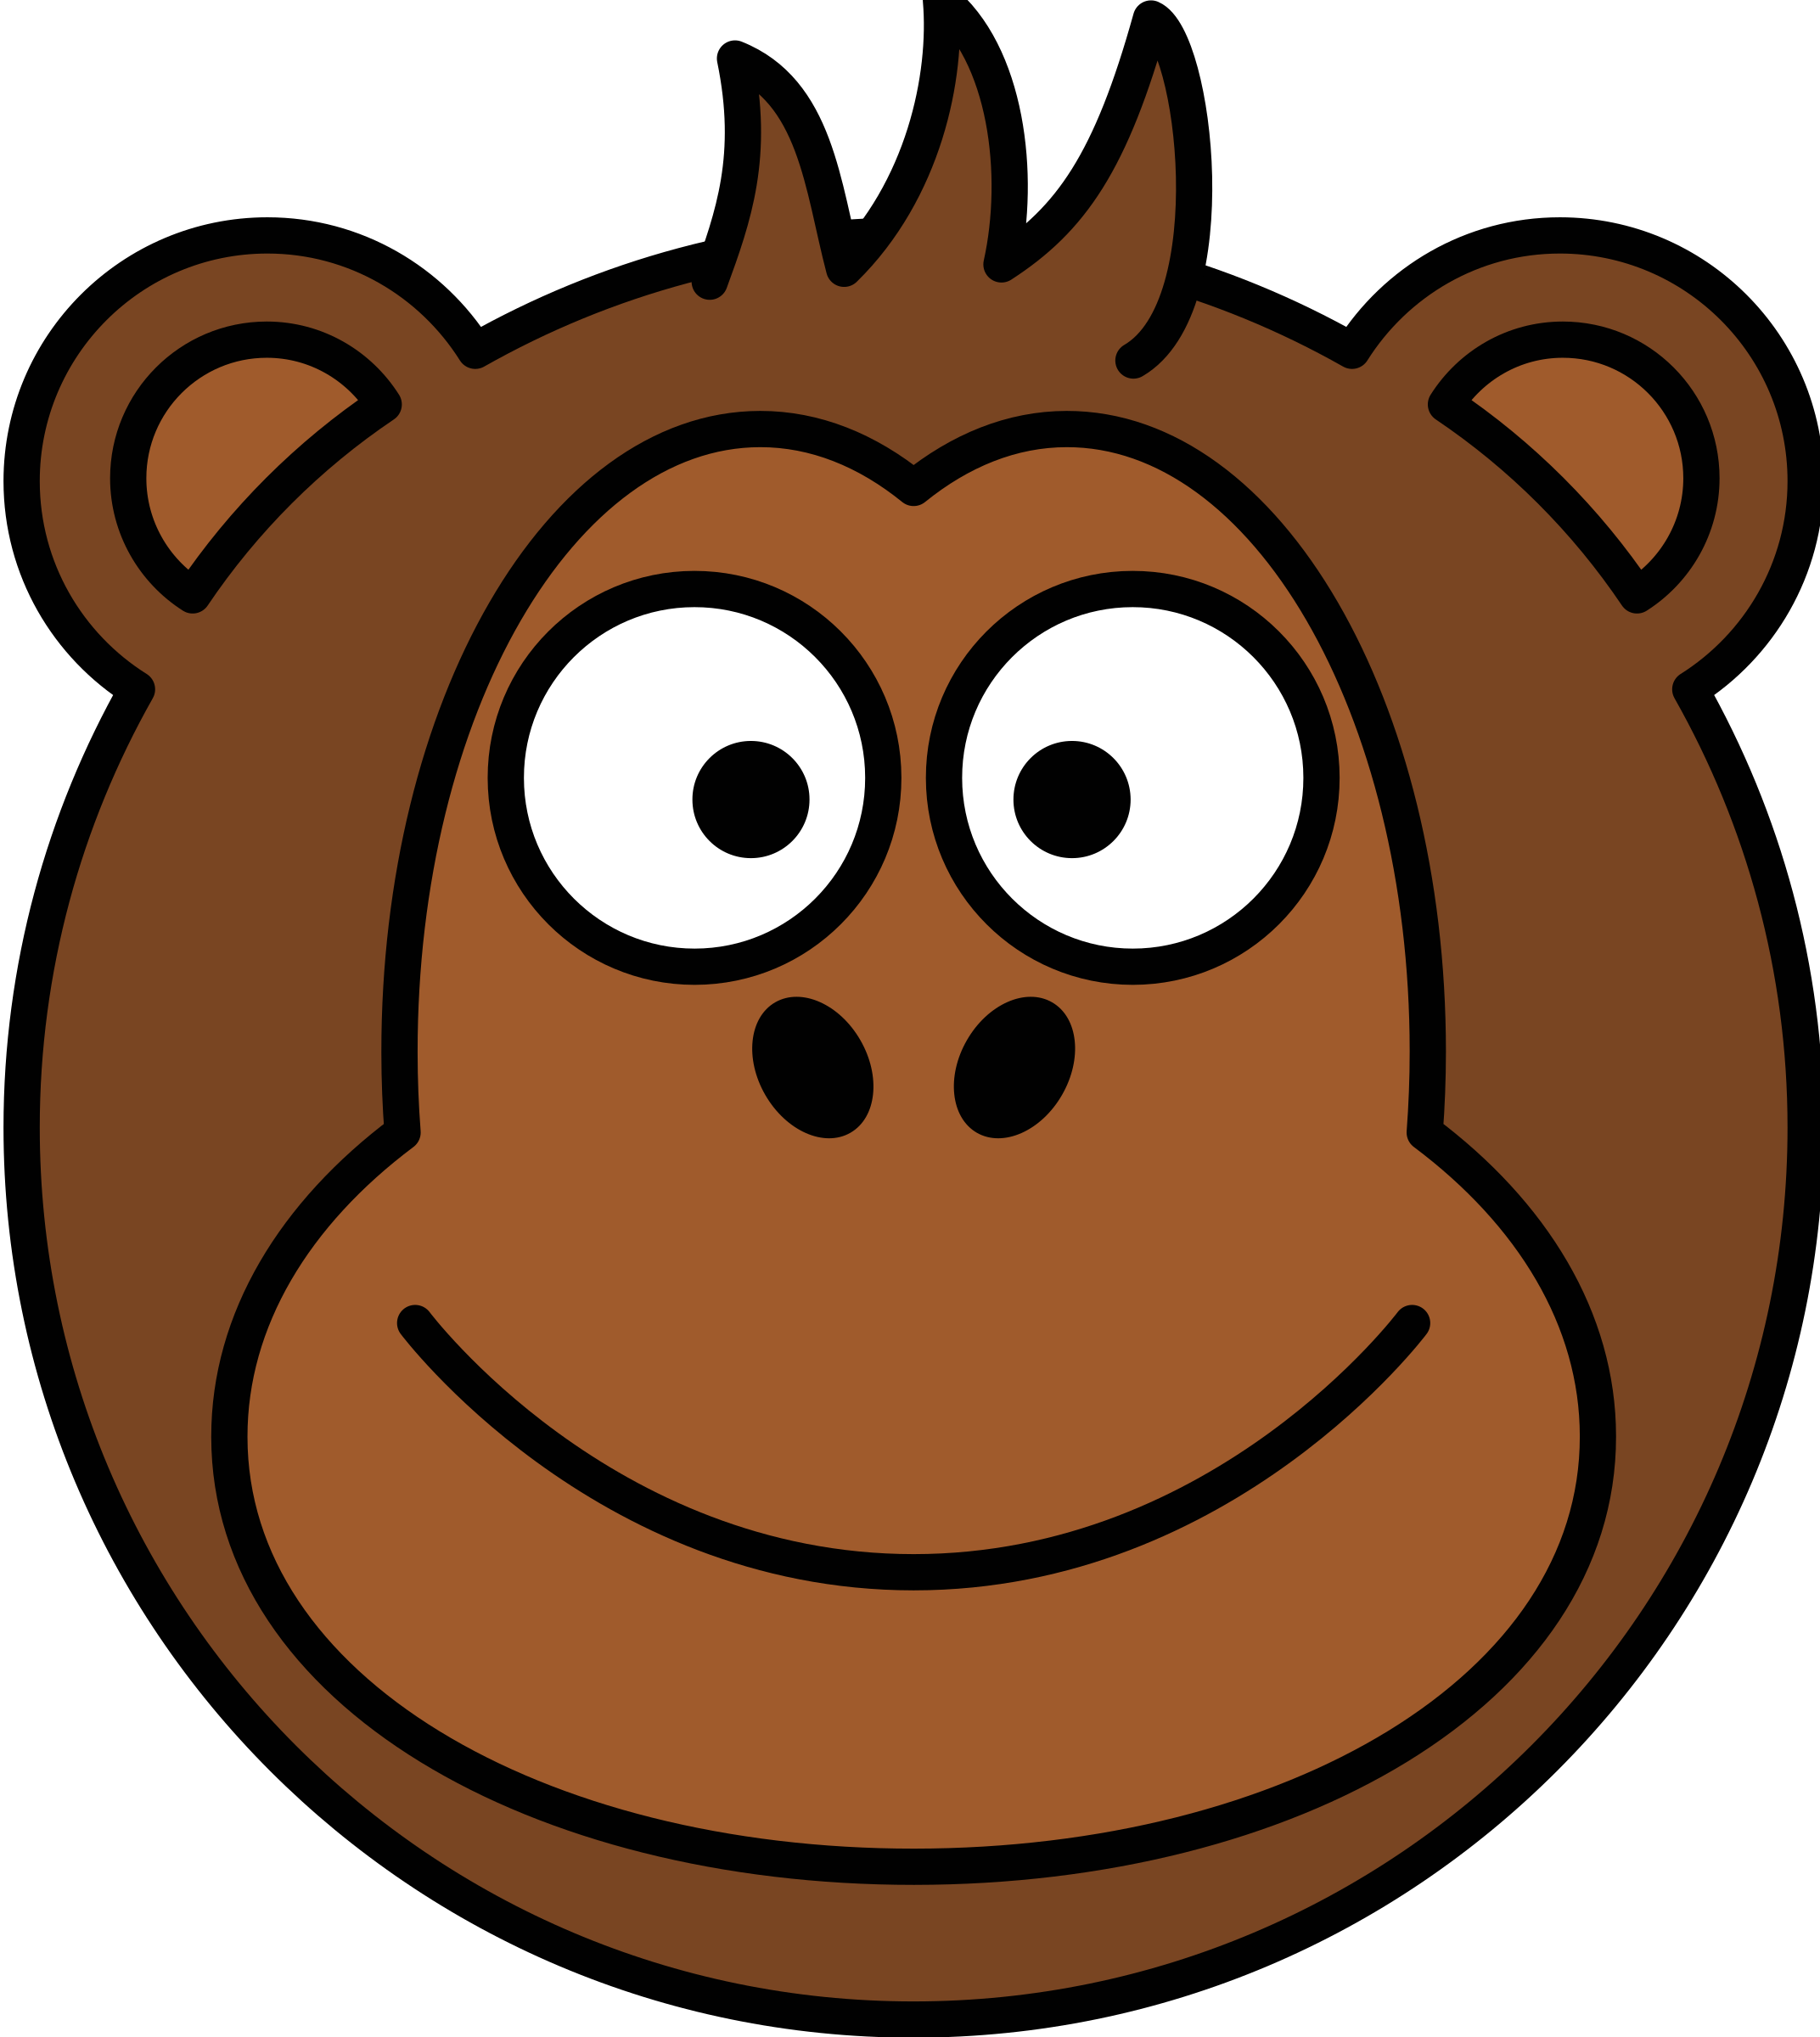 clipart monkey head rh openclipart org cartoon monkey head image cartoon monkey with m on head